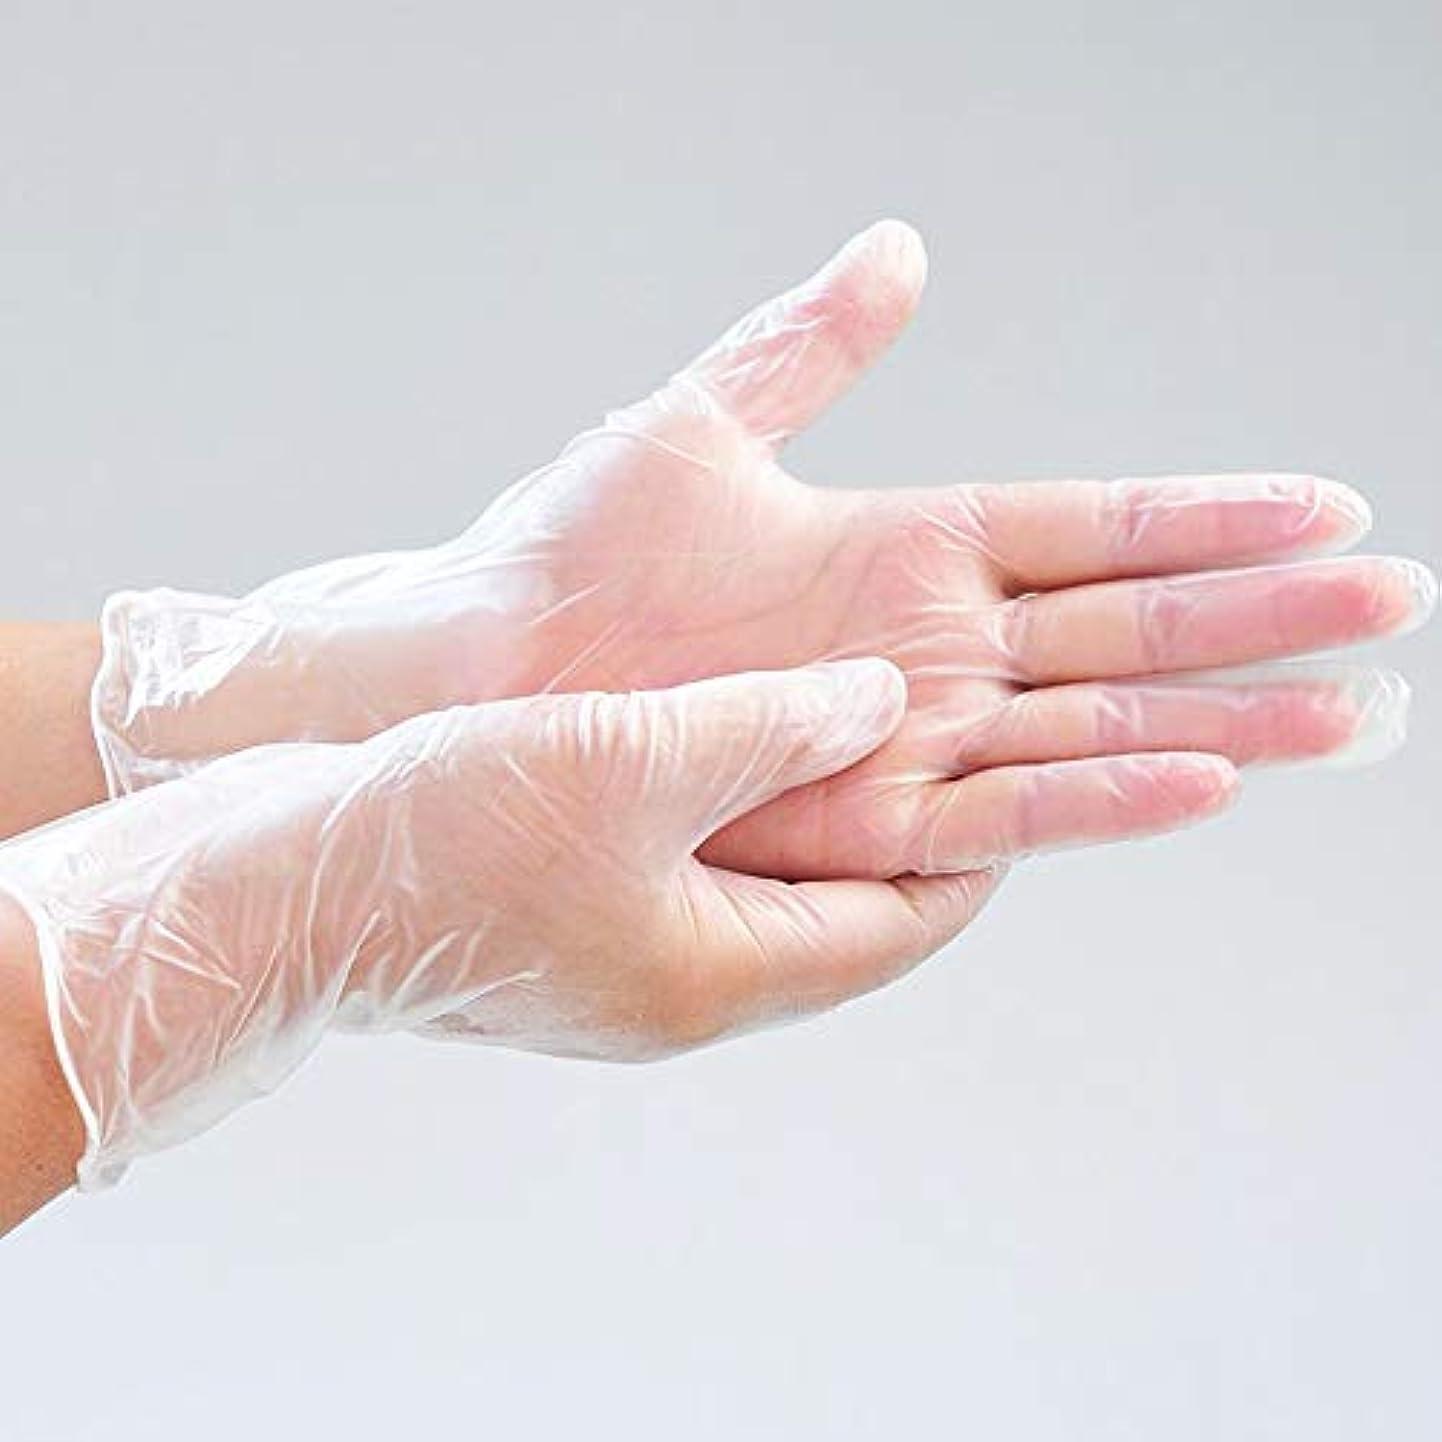 OWSOO 使い捨てグローブ 使い捨て透明PVC手袋 パウダーフリー 肥厚 防水用 実用 衛生 使い捨て手袋 高温抵抗 引張抵抗 実験室 歯科 炊事 家事 バーベキュー ケータリング ホーム用 透明 100ピースM